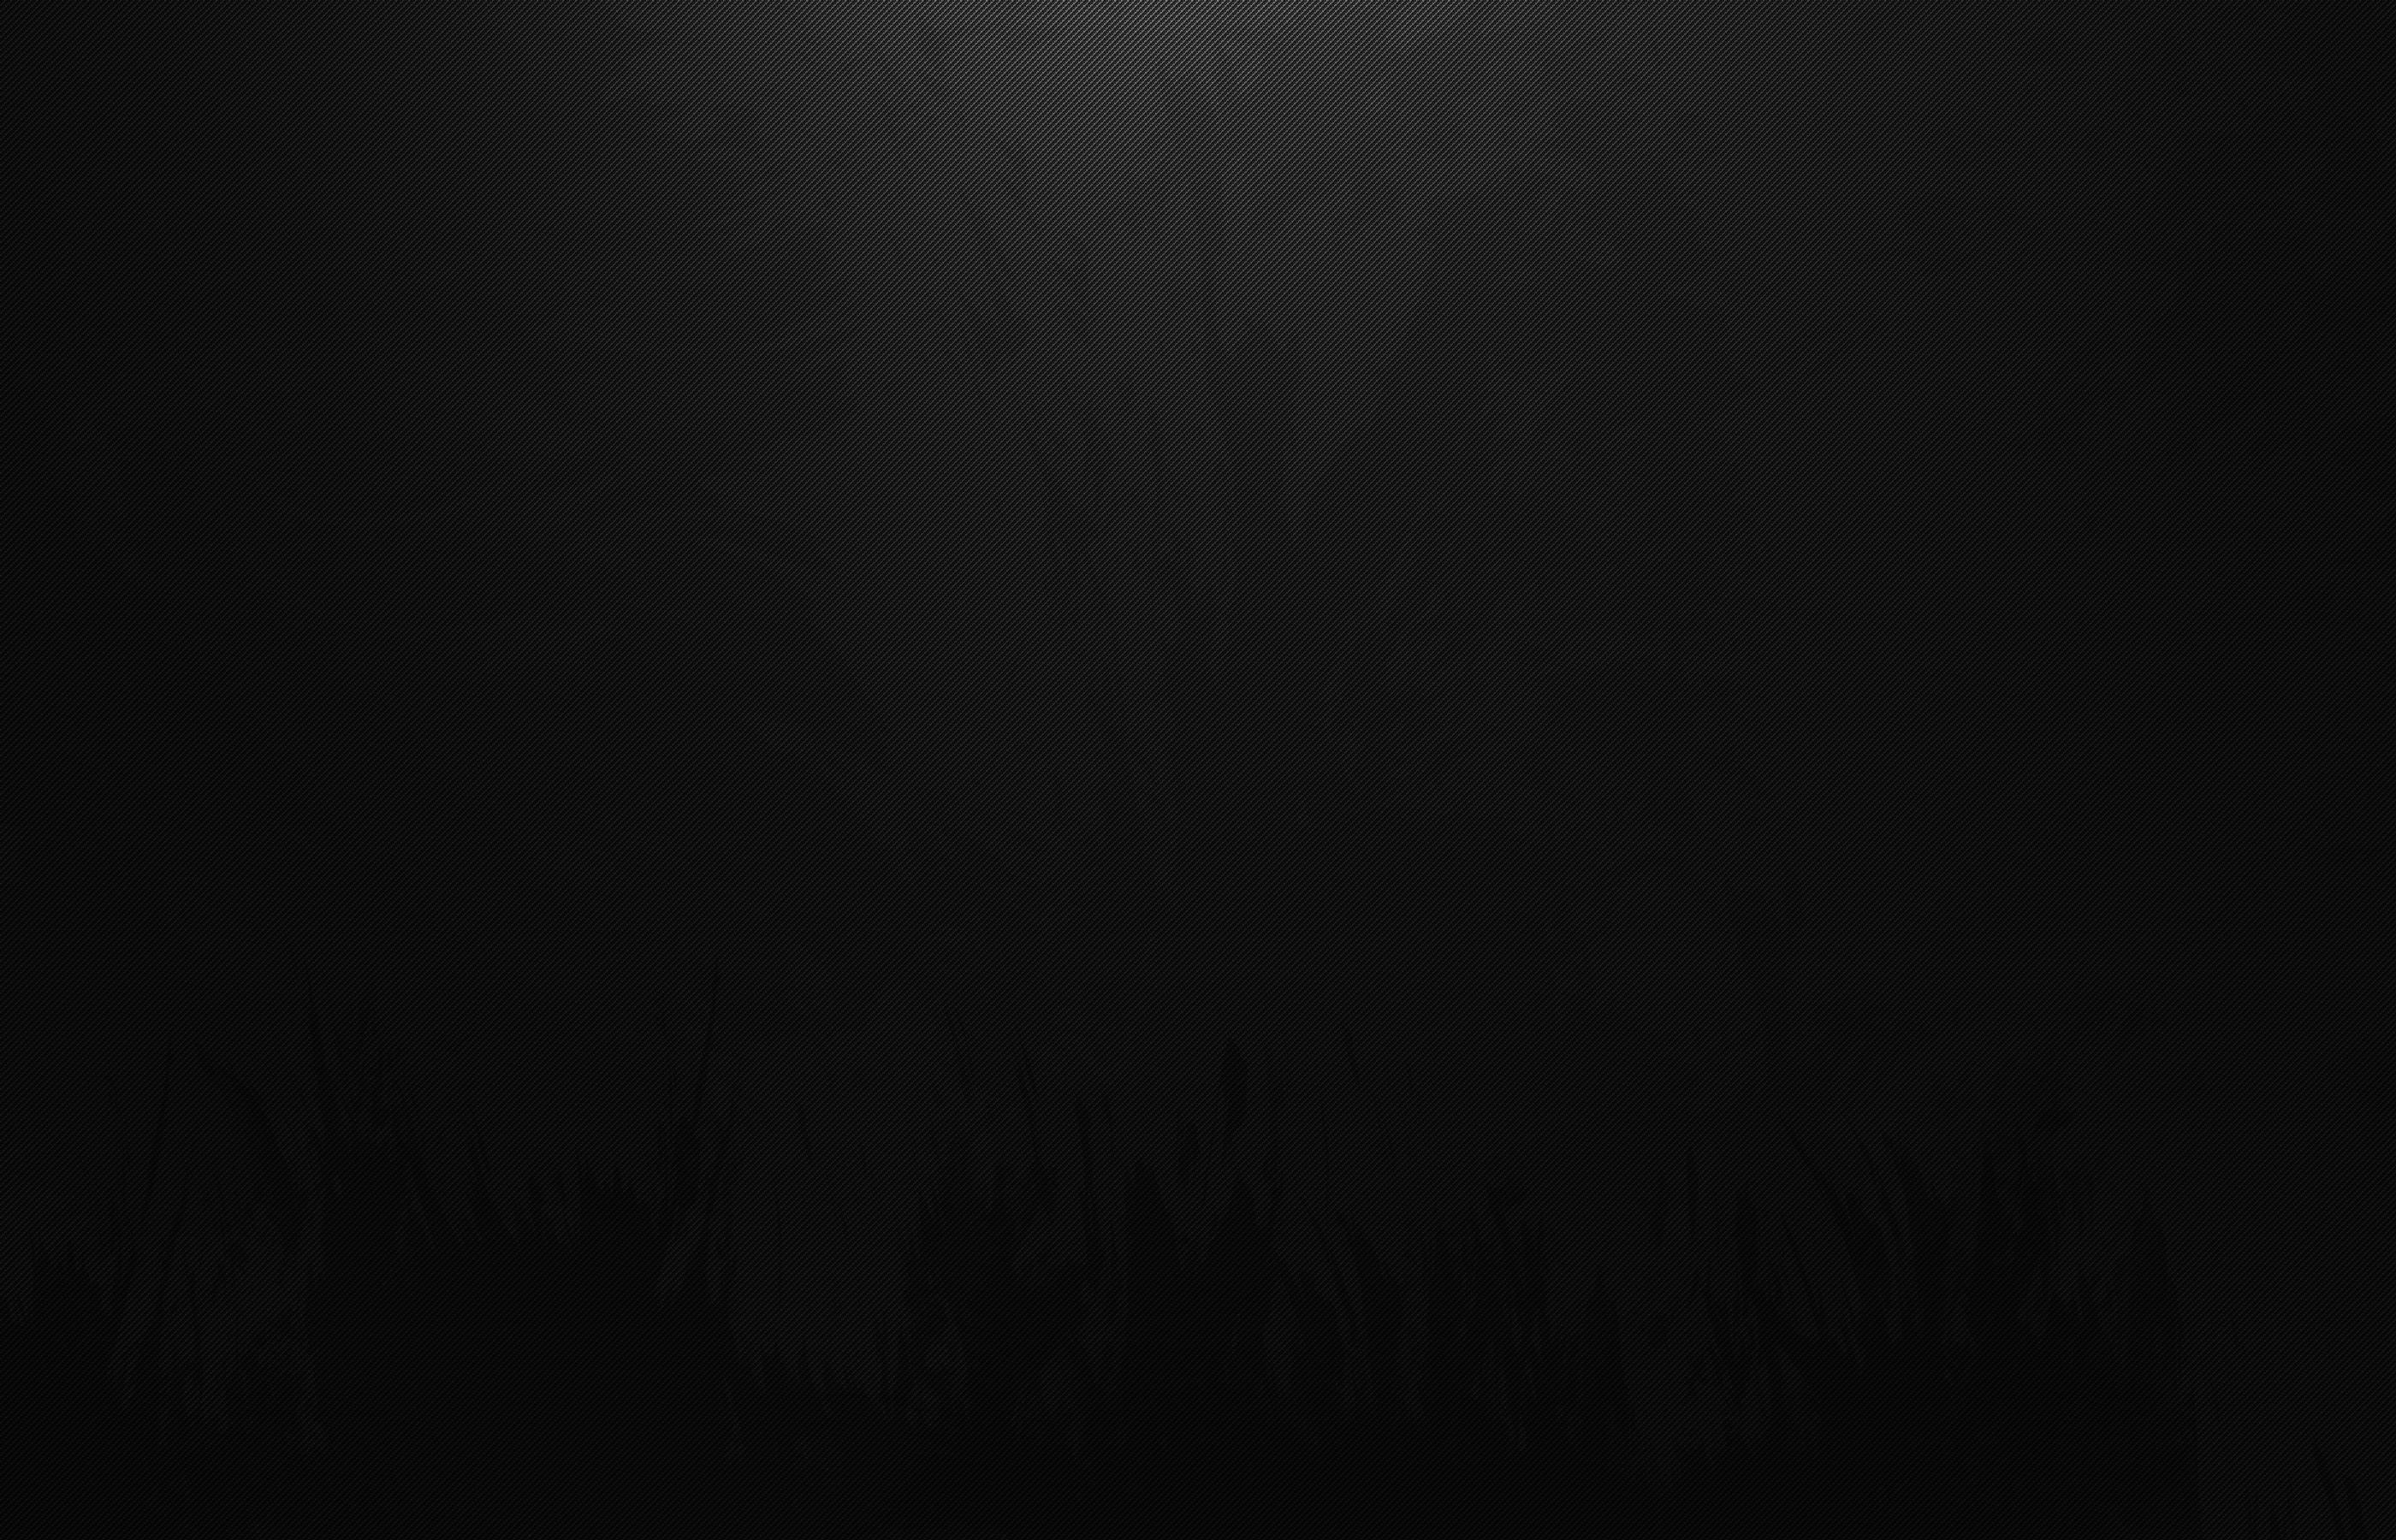 Dark grey pattern wallpaper 2800x1800